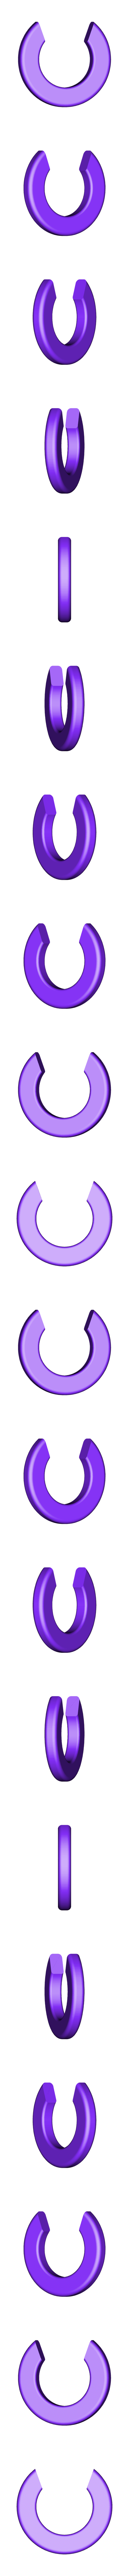 clip_illusion_.stl Download free STL file Spiral optic illusion 2 • 3D printing design, NOP21